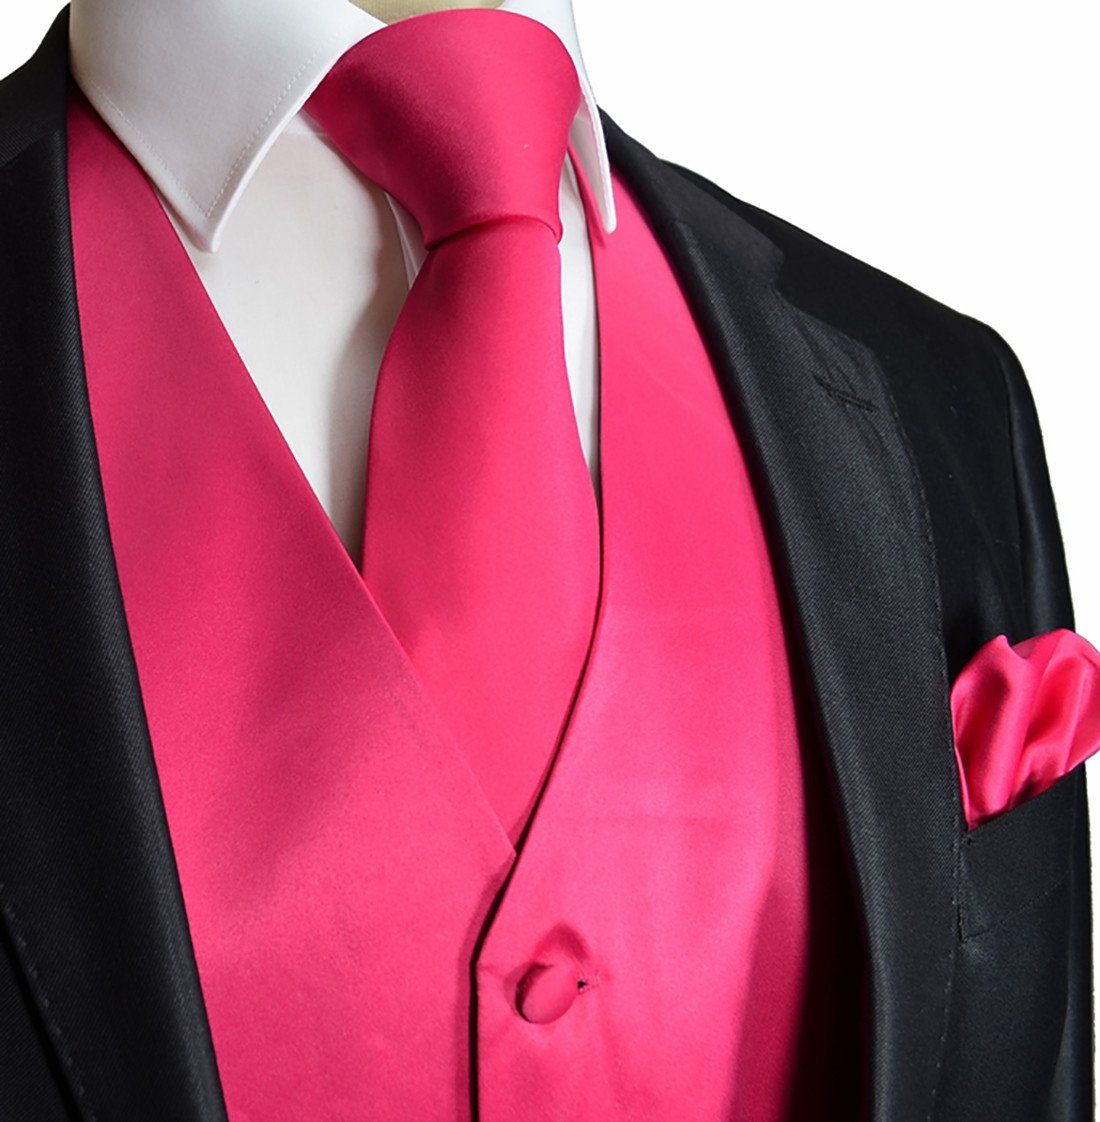 New Brand Q Men/'s Micro Fiber Paisley Neck Tie /& Hankie Set Fuchsia formal